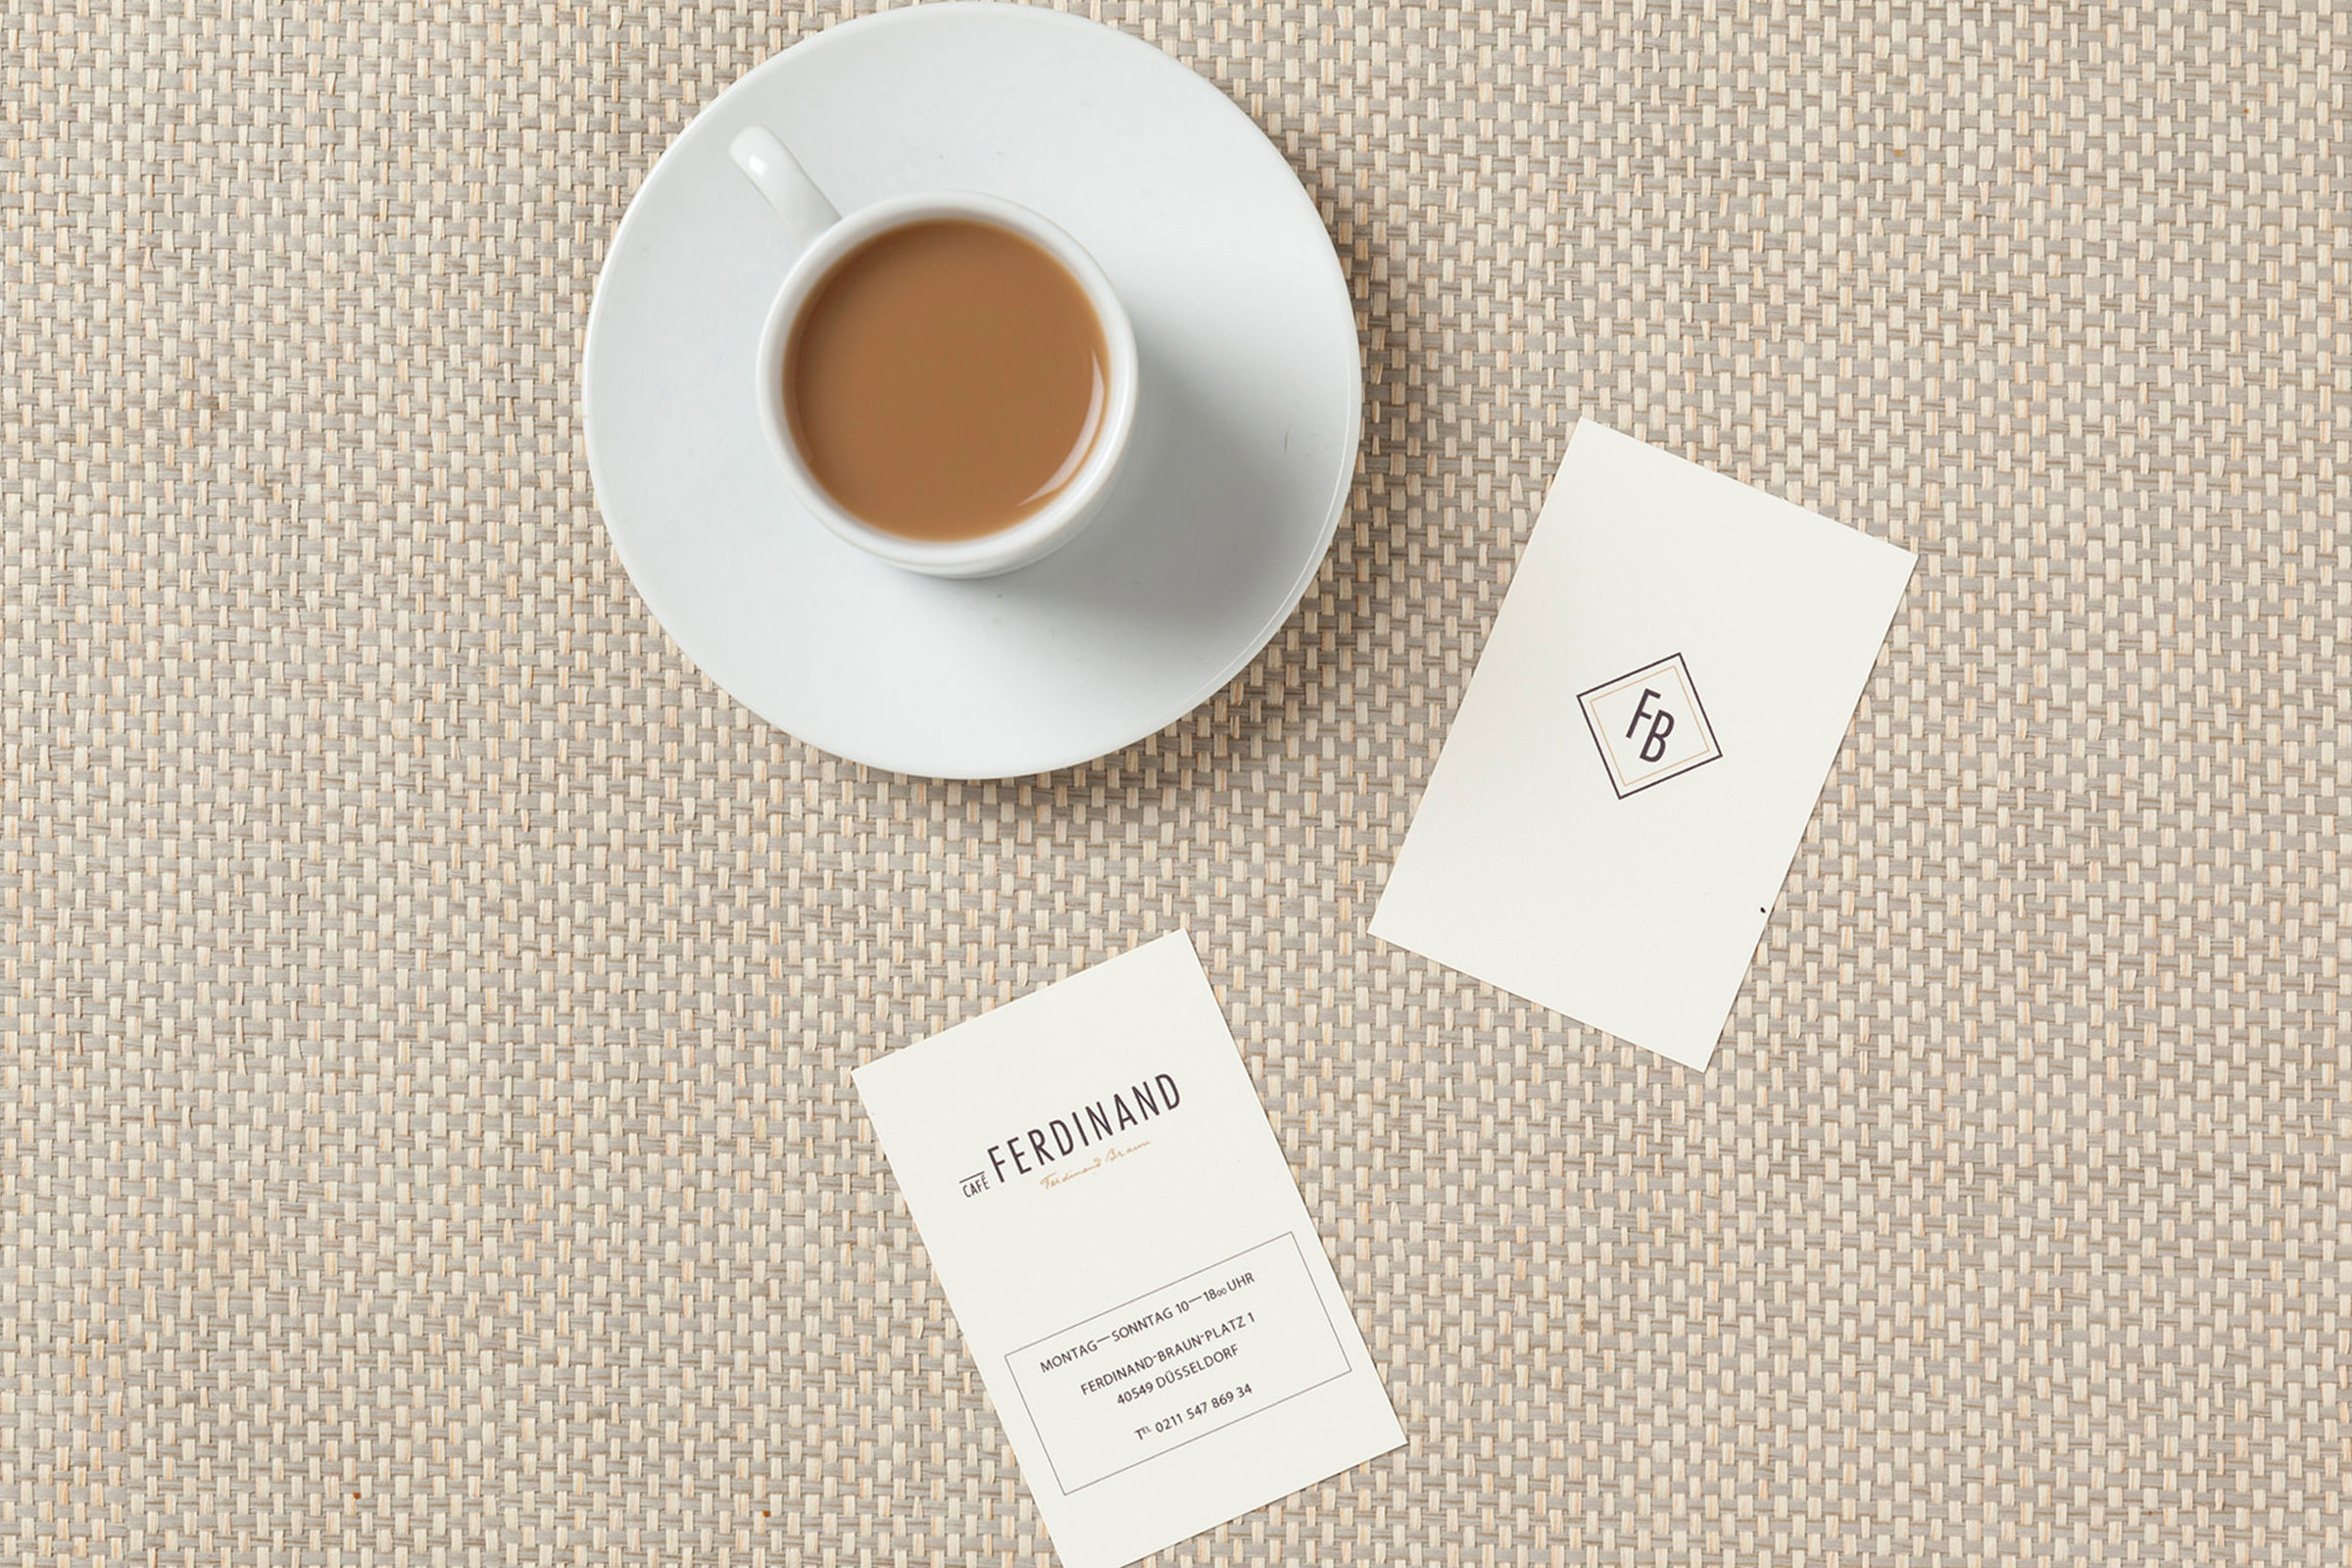 Cafè Ferdinand, Vodafone, Hamburg, Jungfernstieg, Visitenkarten, Restaurant Branding, Kaffee